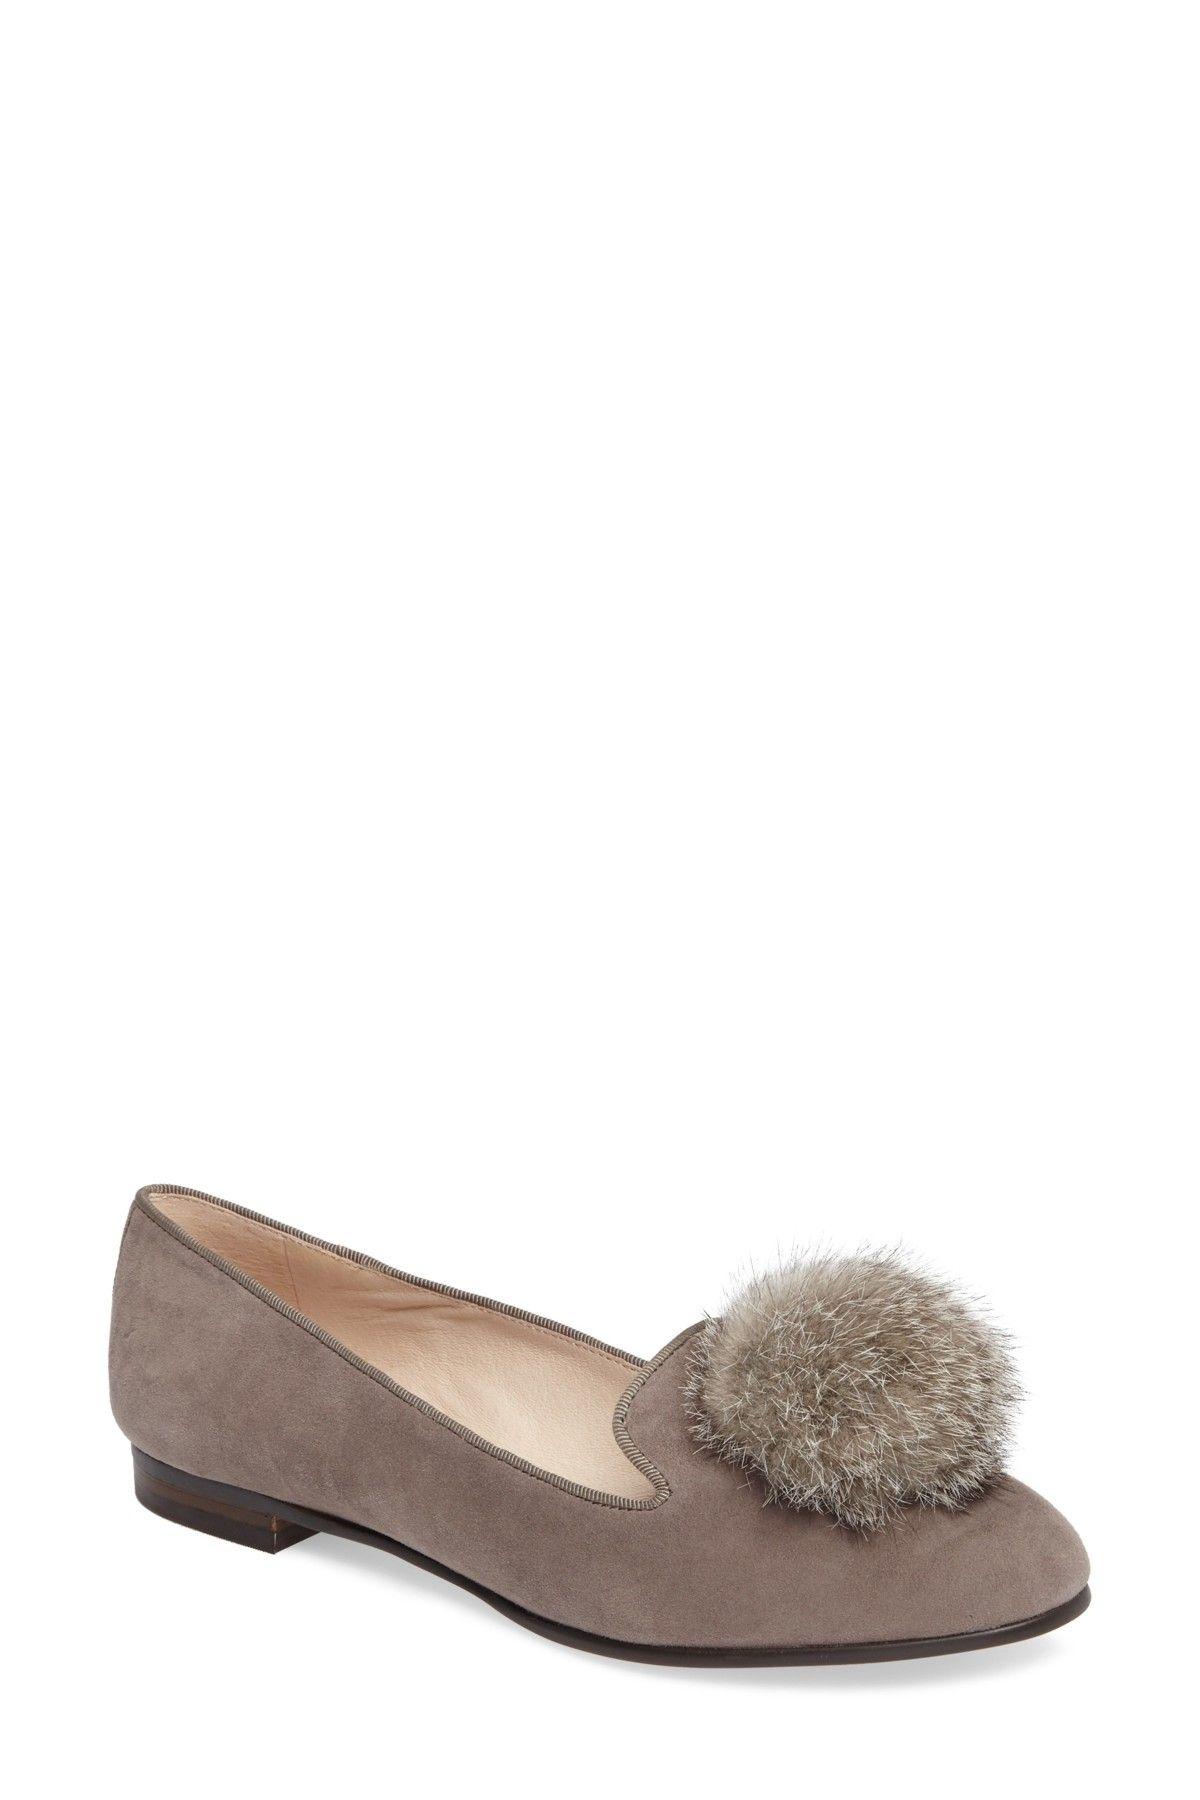 f4aa91d4938 Andres Genuine Rabbit Fur Pom Loafer